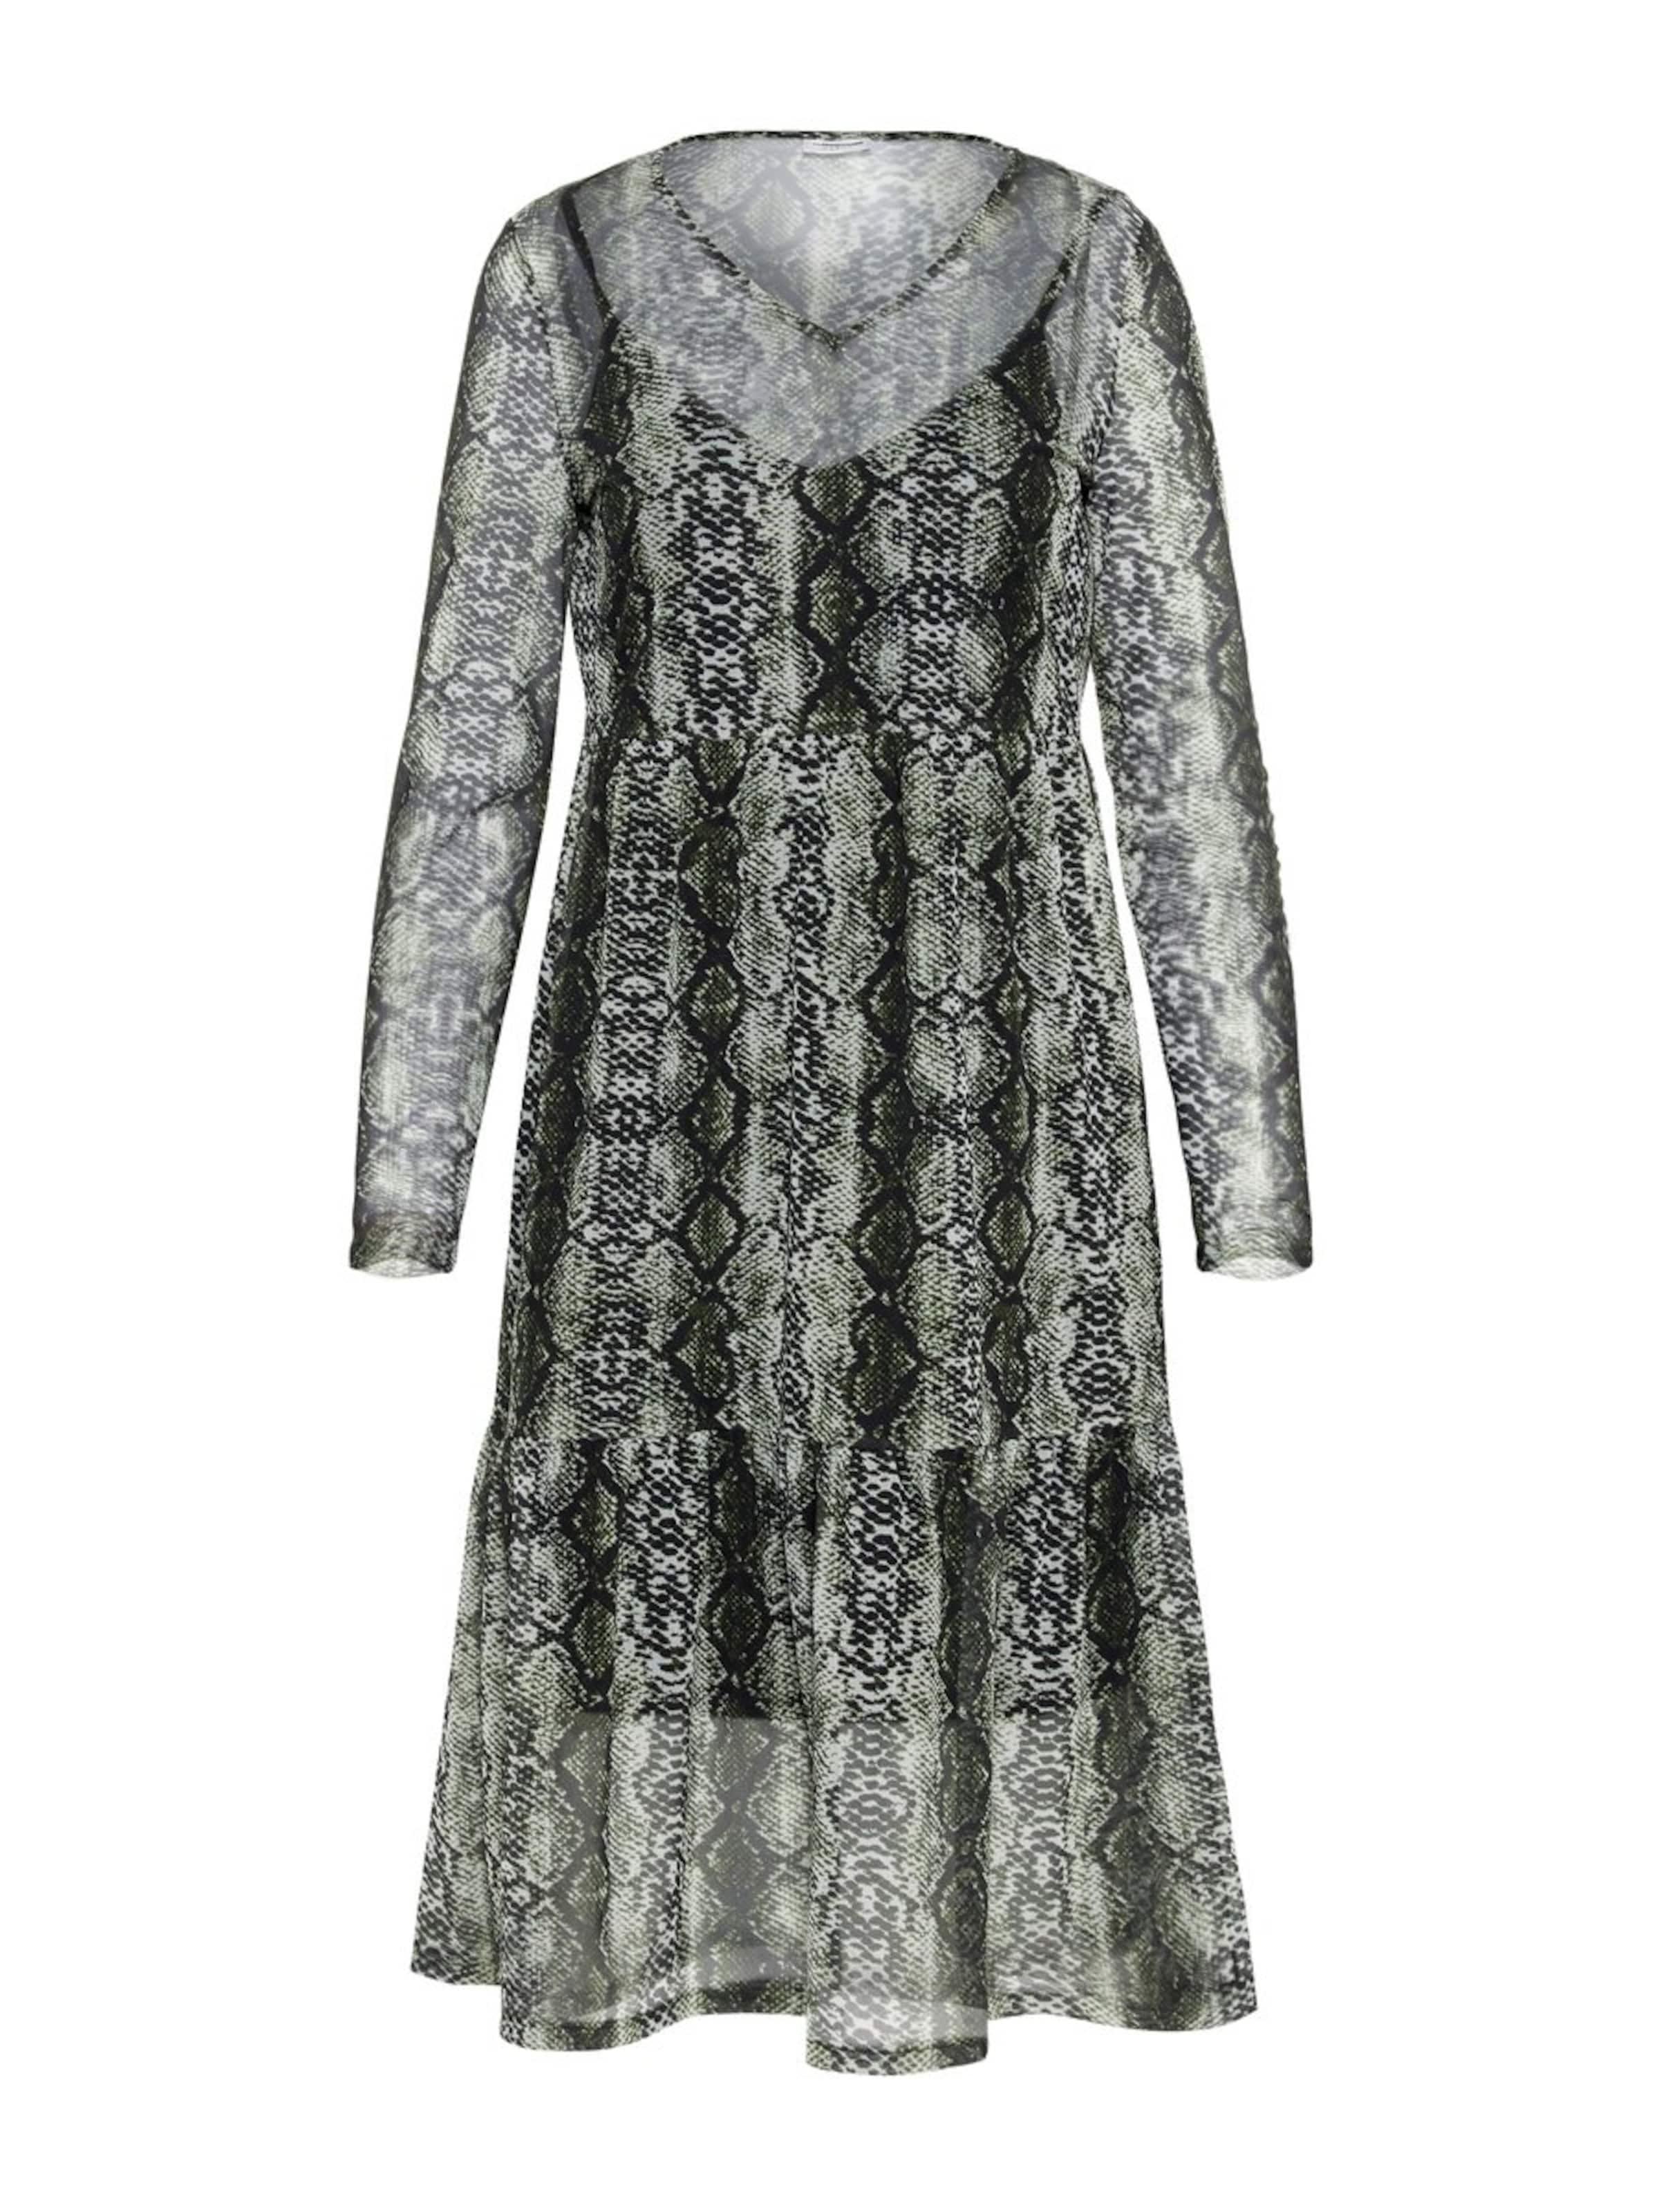 Kleid May PastellgrünSchwarz 'lesly' In Noisy v8wn0mN